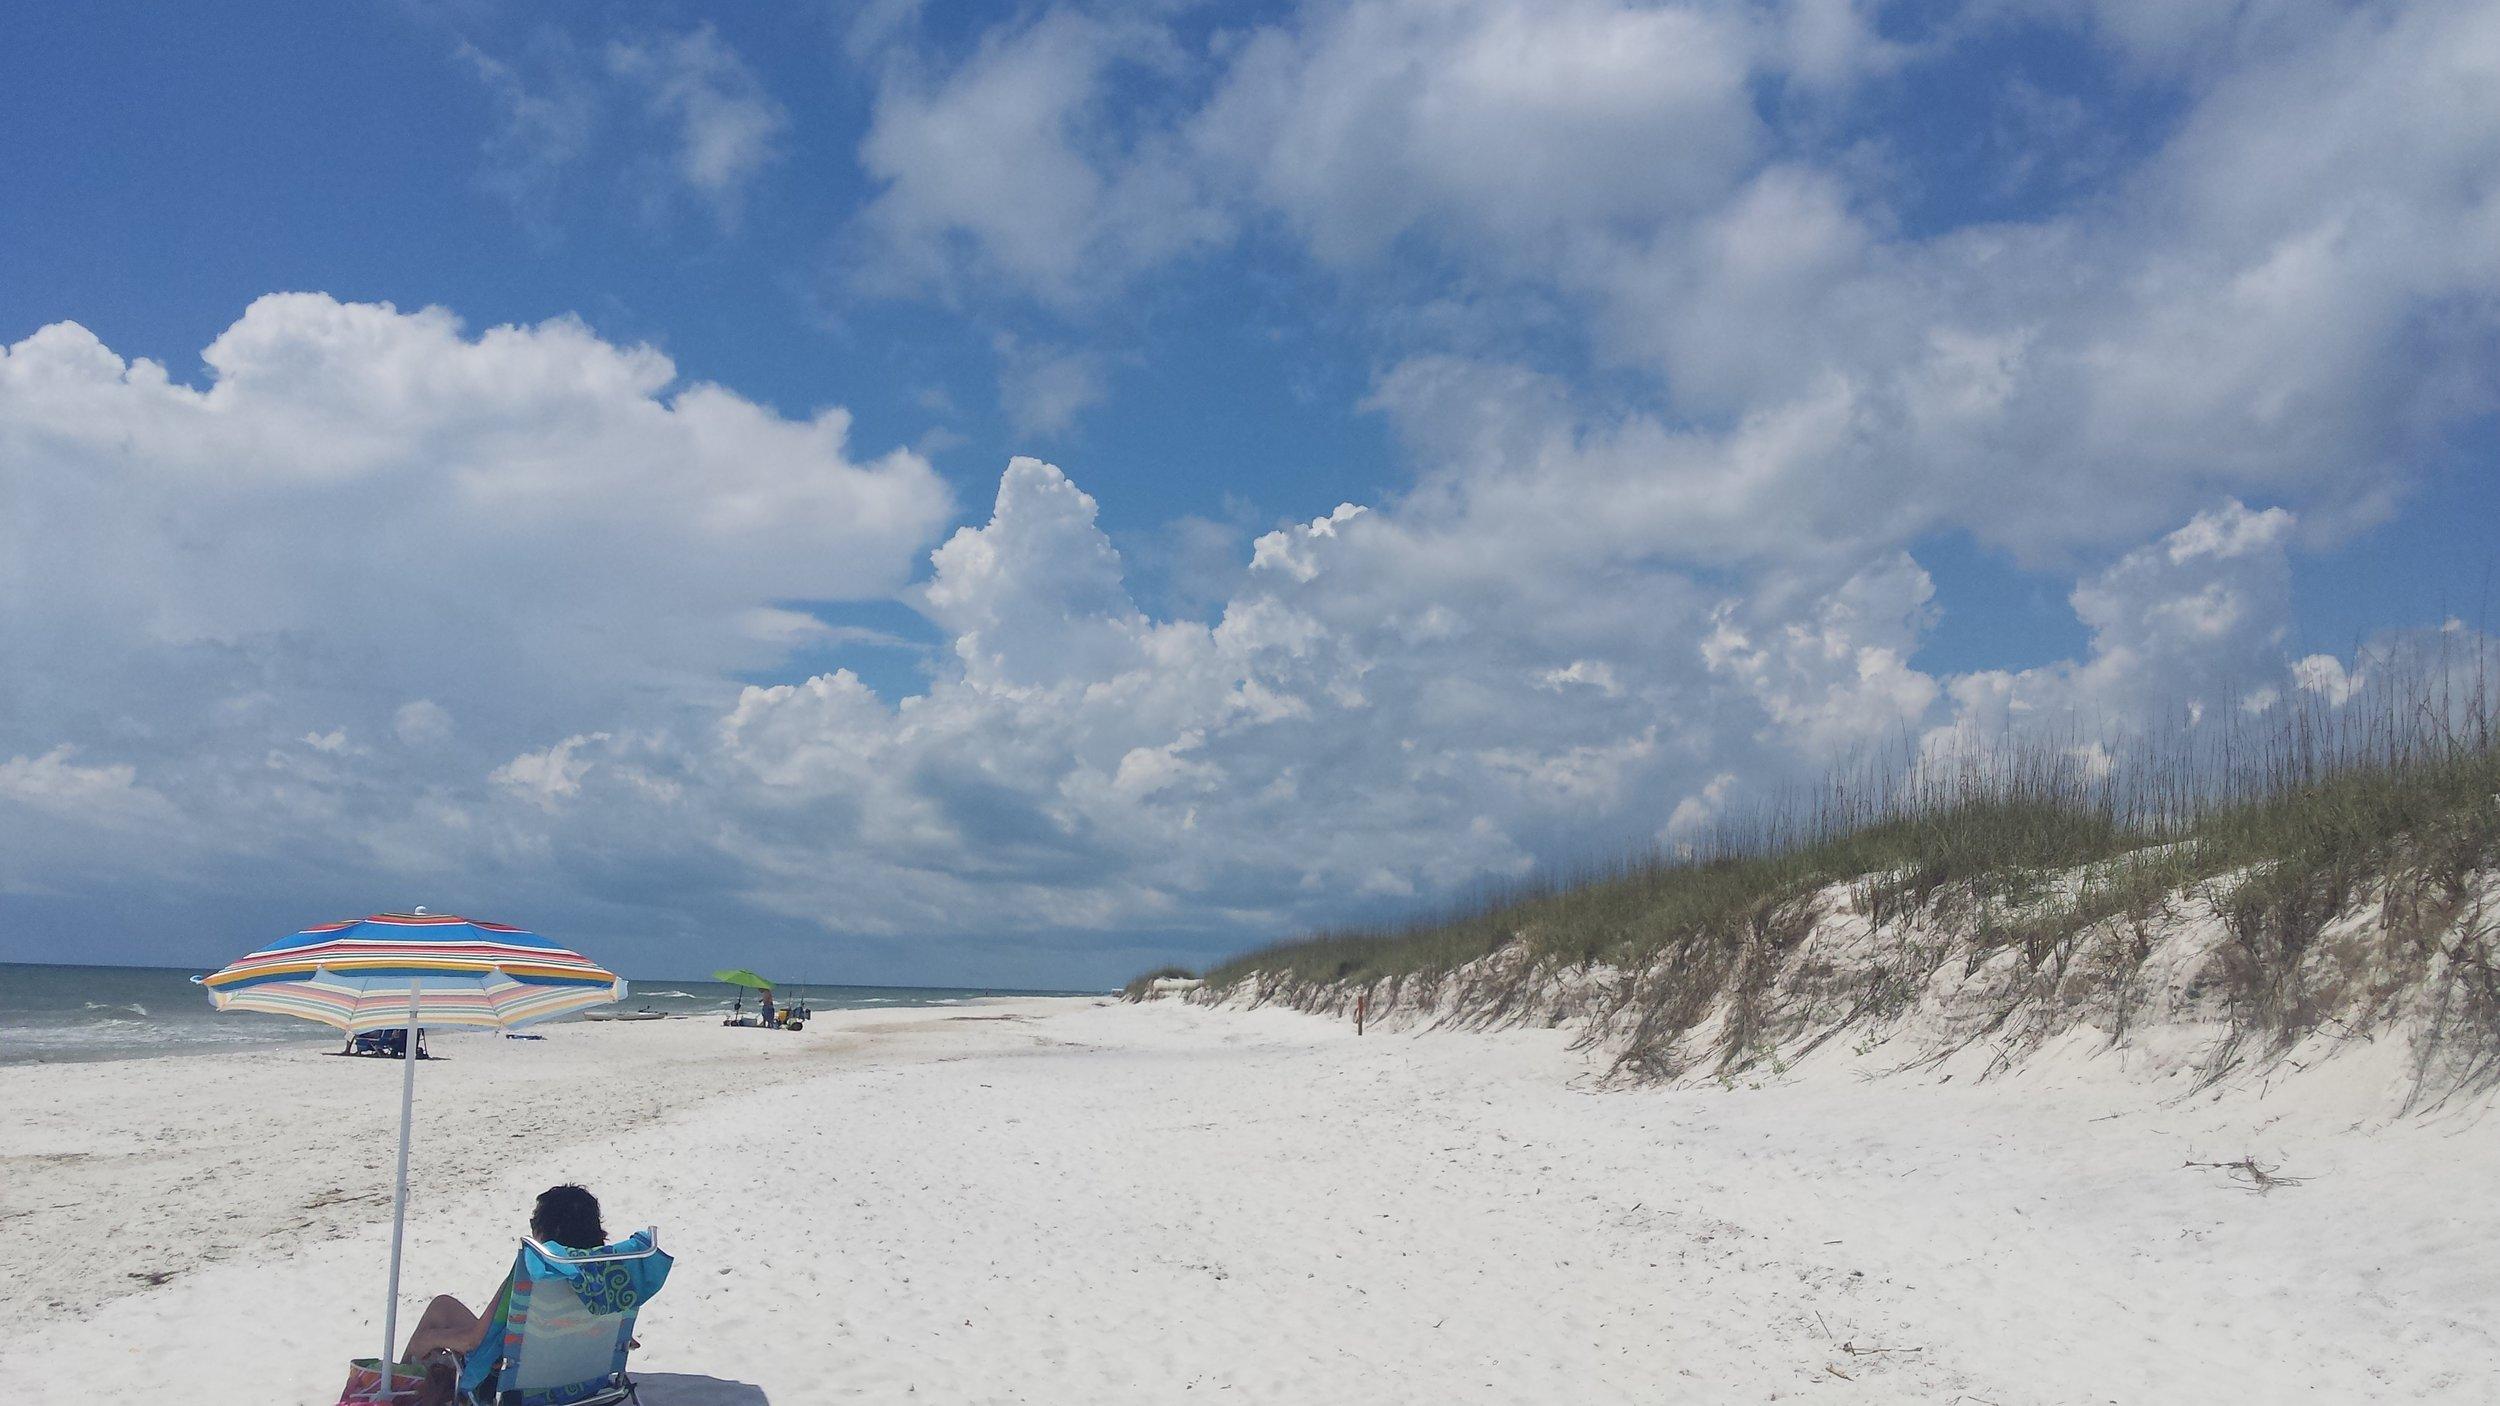 Cape San Blas state park beach and dunes.